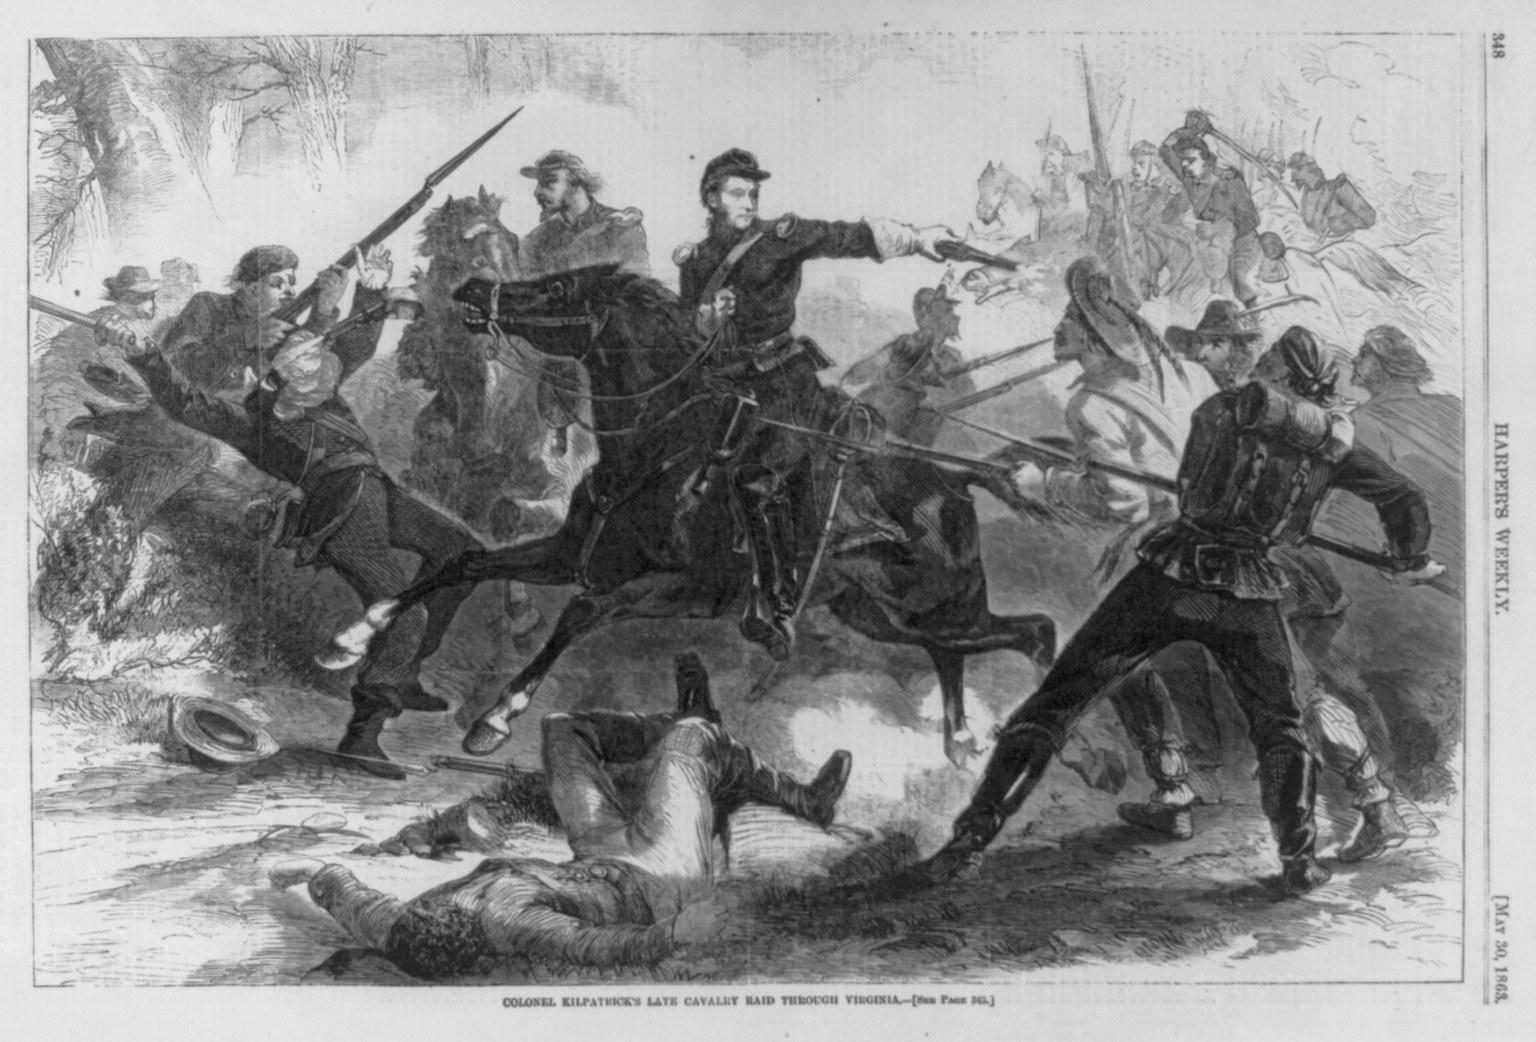 150th Anniversary Reenactment of Kilpatrick's Raid